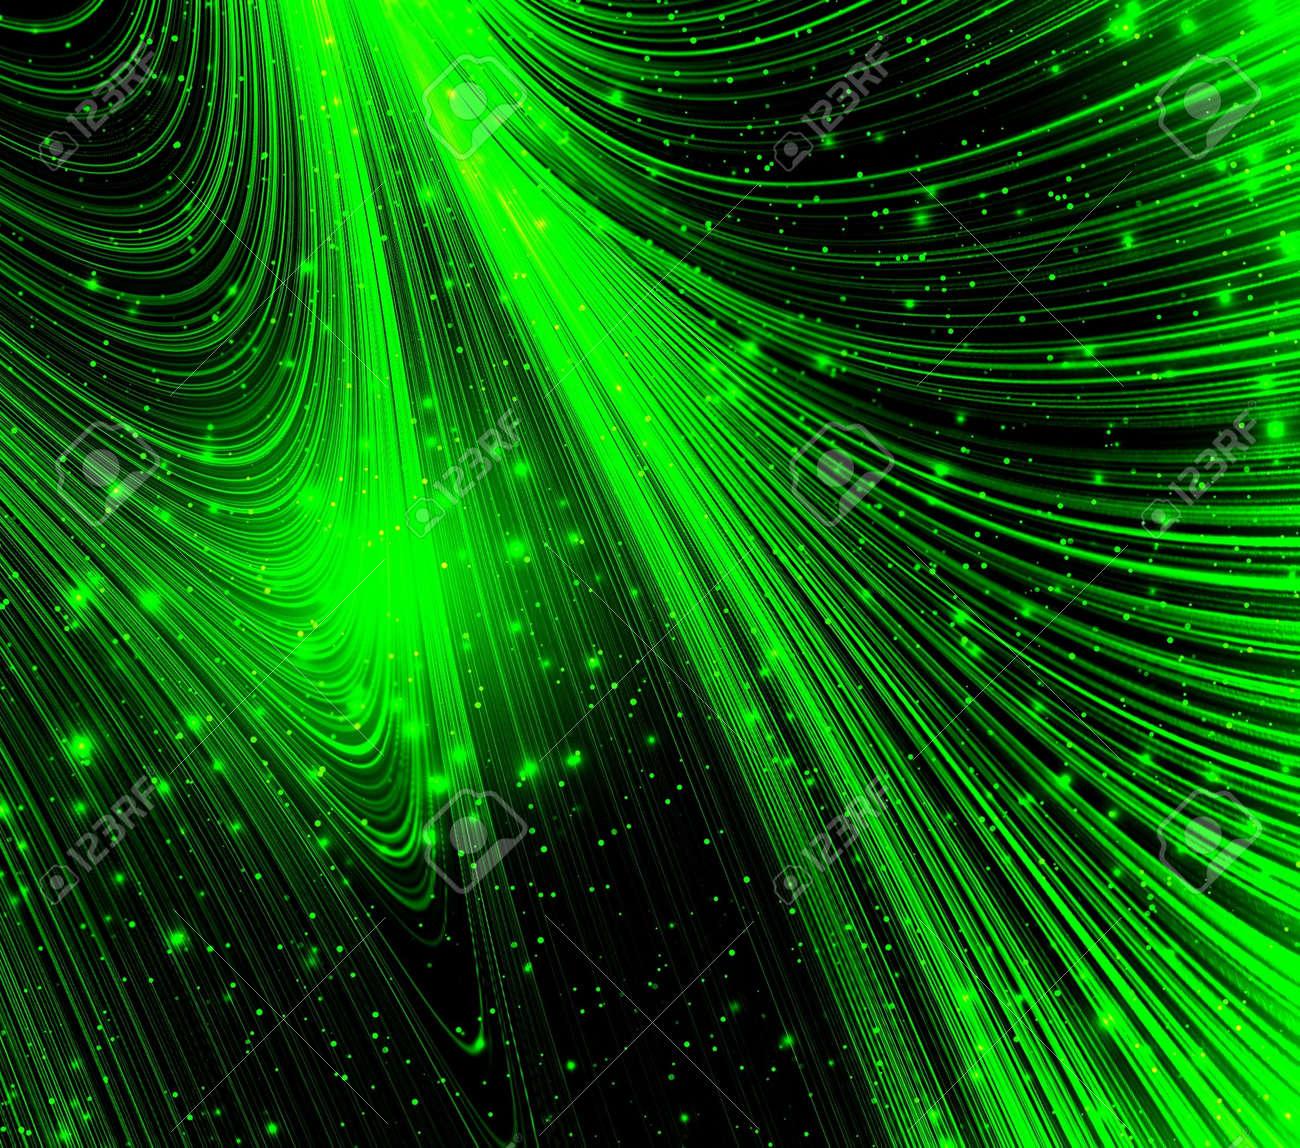 Neon Green Light Stock Photo